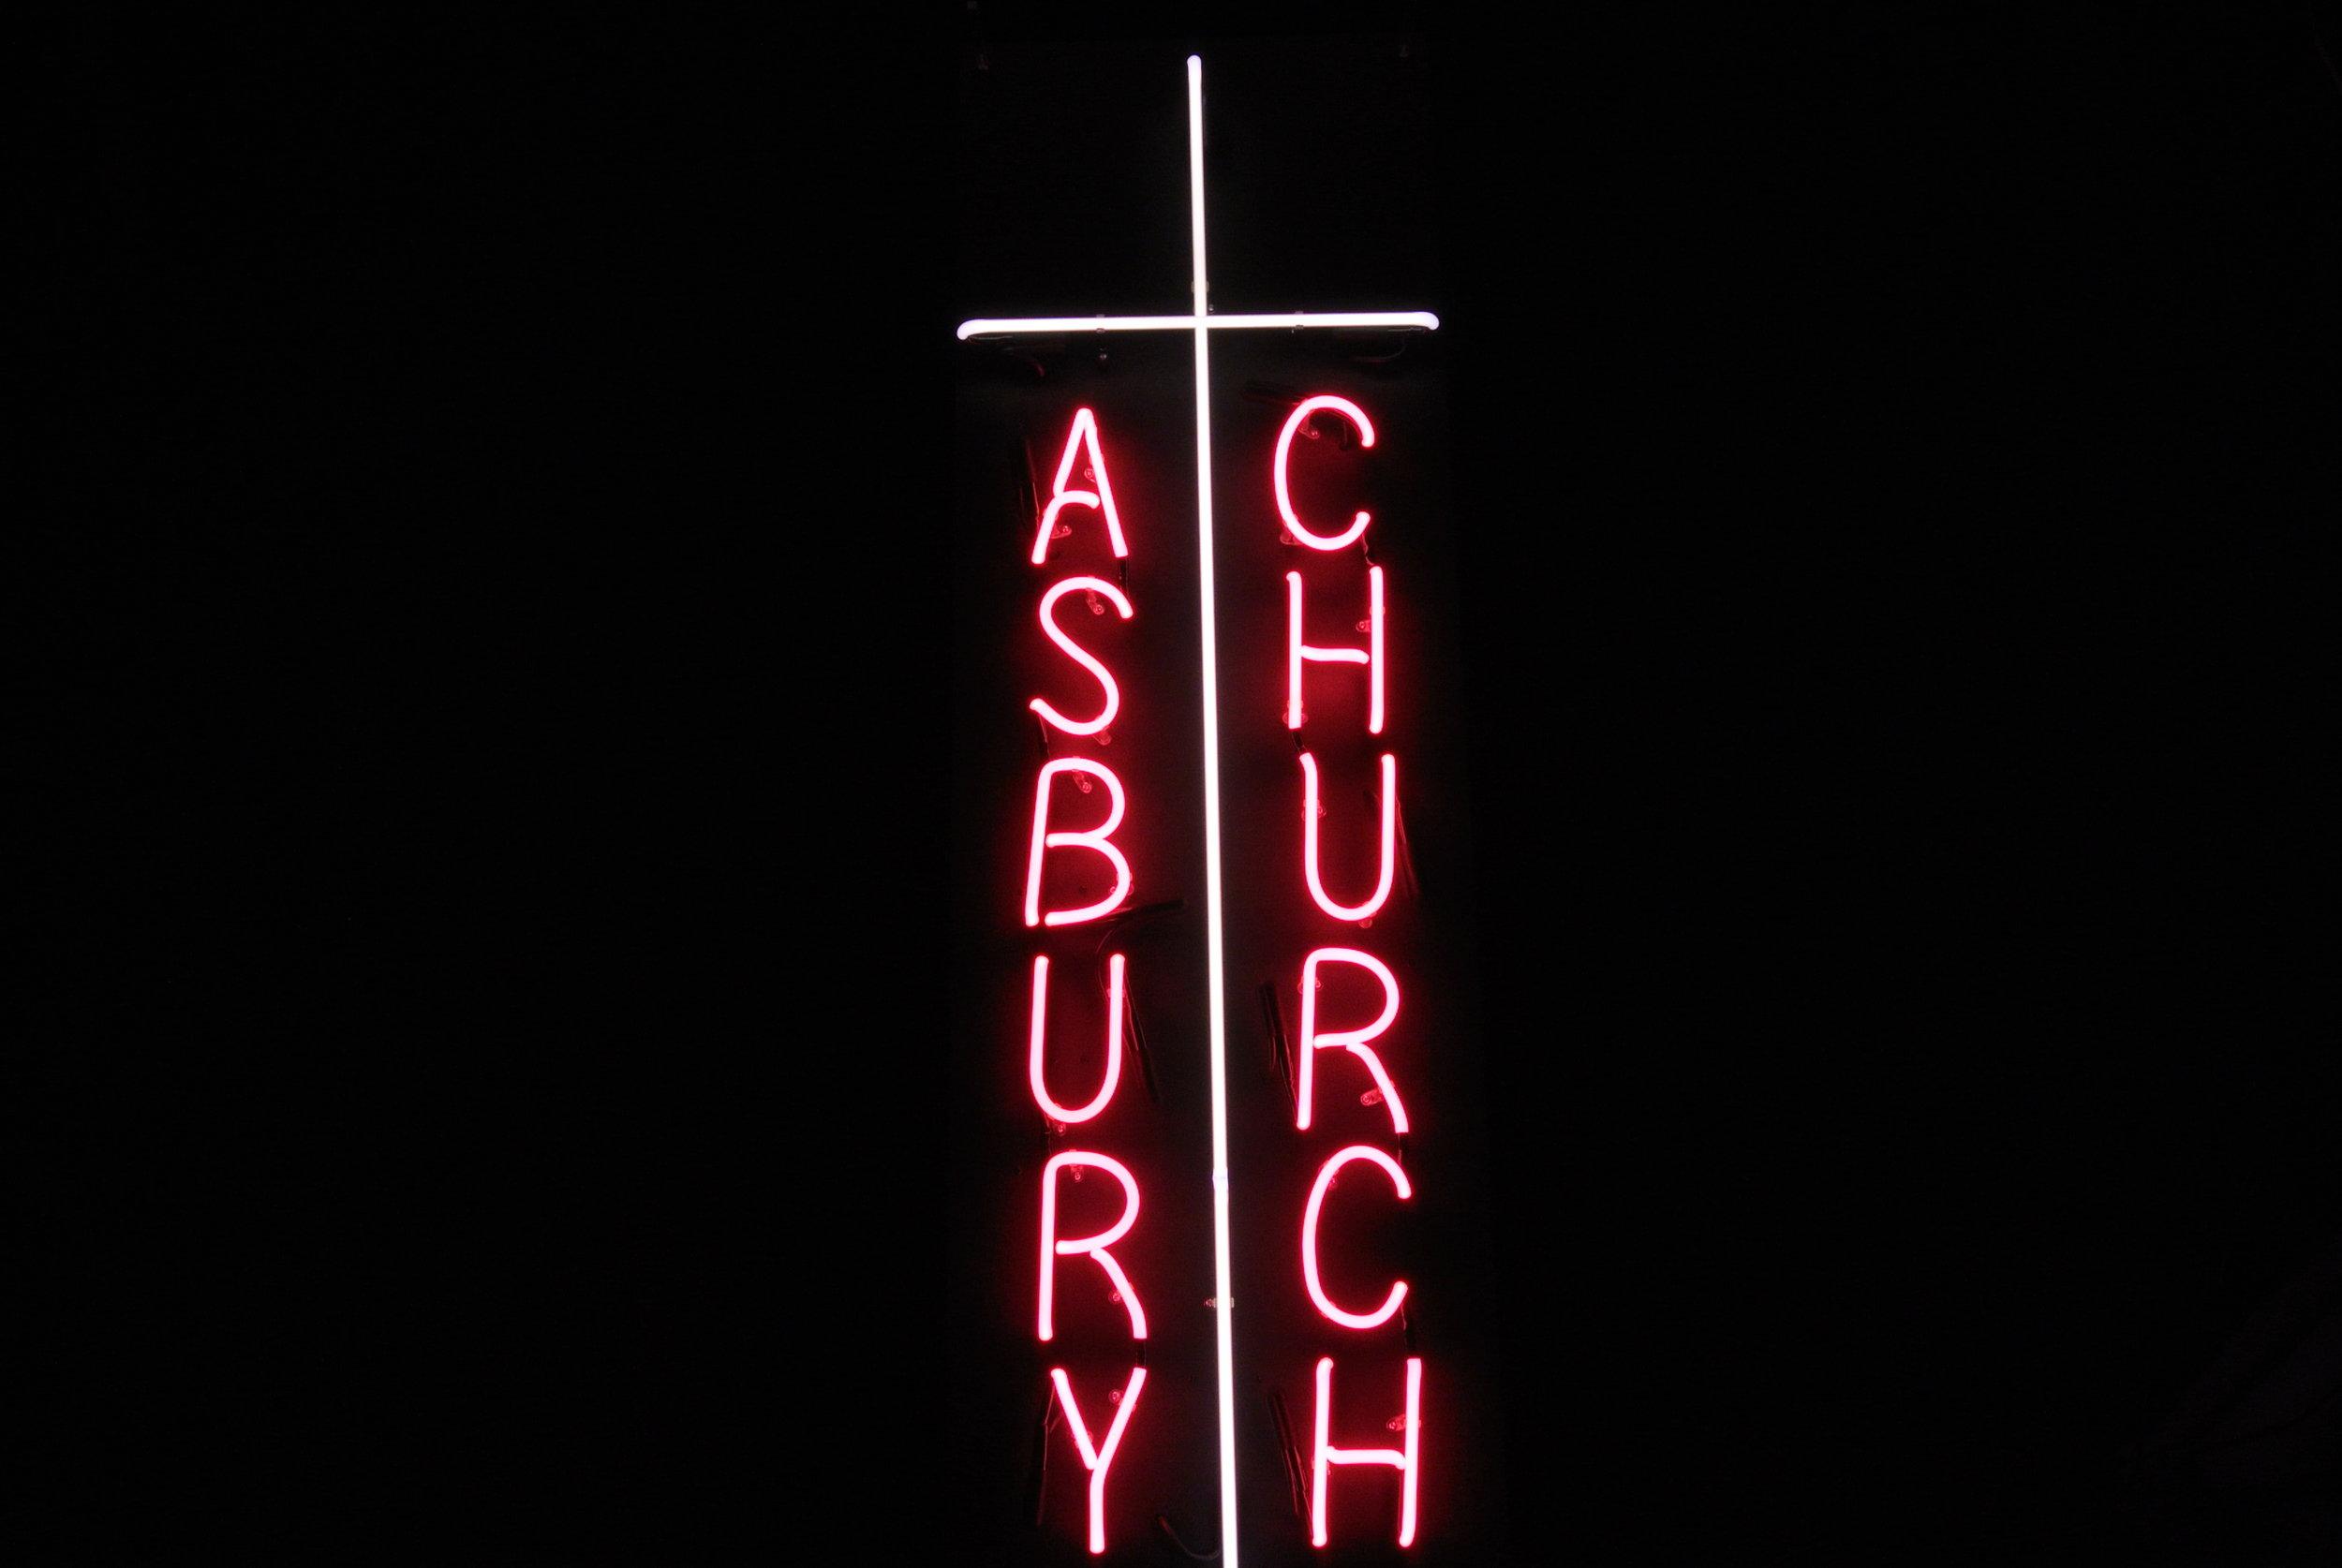 Custom neon church signs by American Neon Glass Artist - John Barton - BartonNeonMagic.com